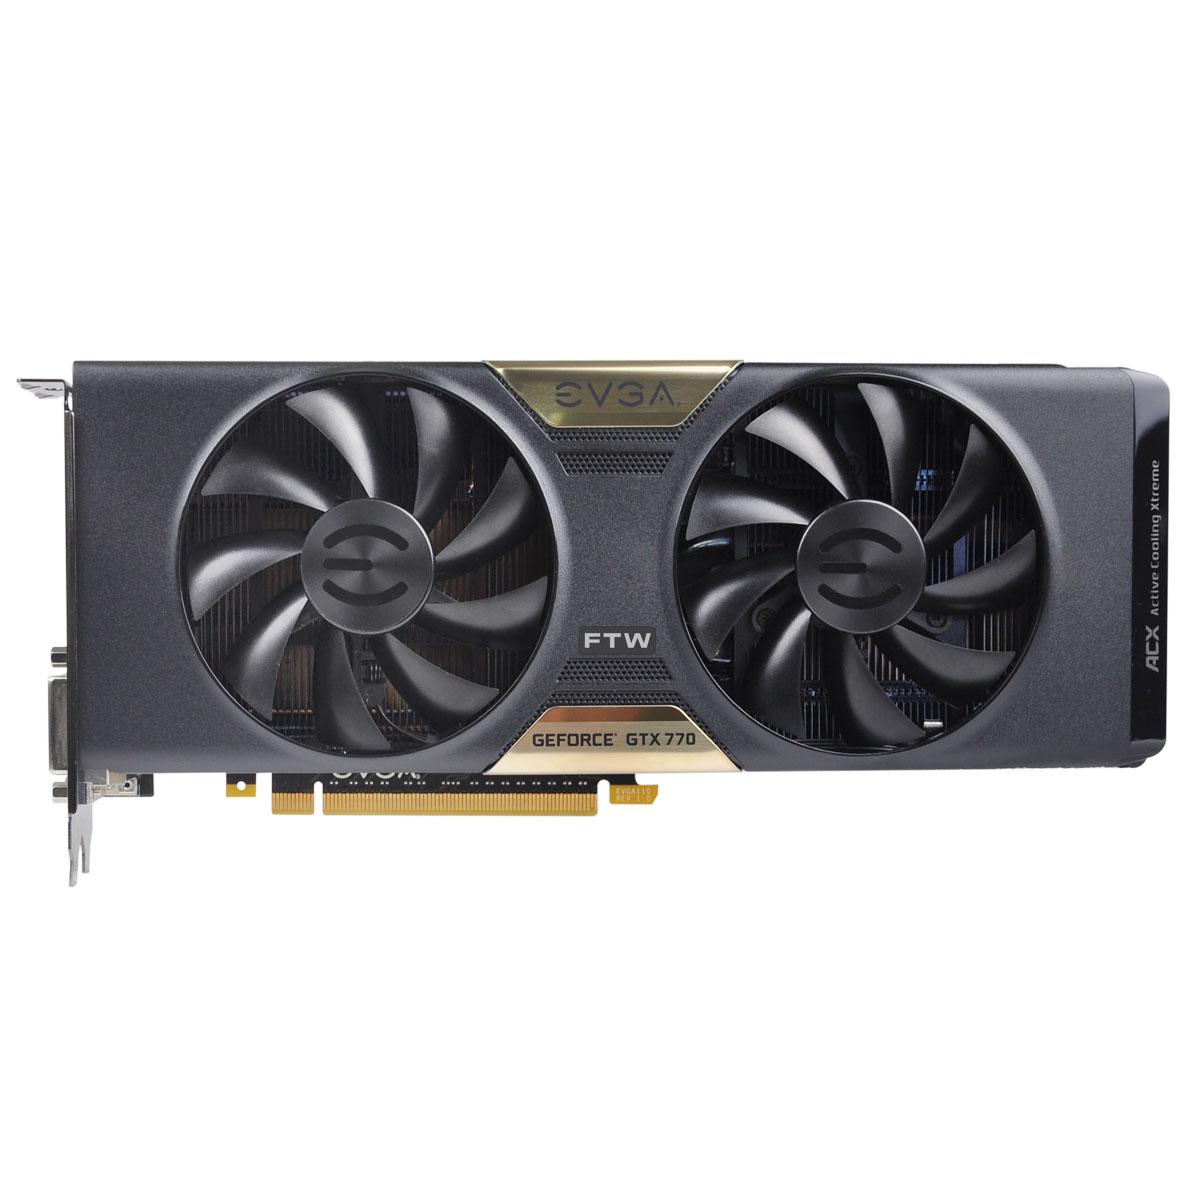 Placa de Video GeForce GTX770 4GB DDR5 256Bits FTW Dual ACX 04G-P4-3776-KR - EVGA